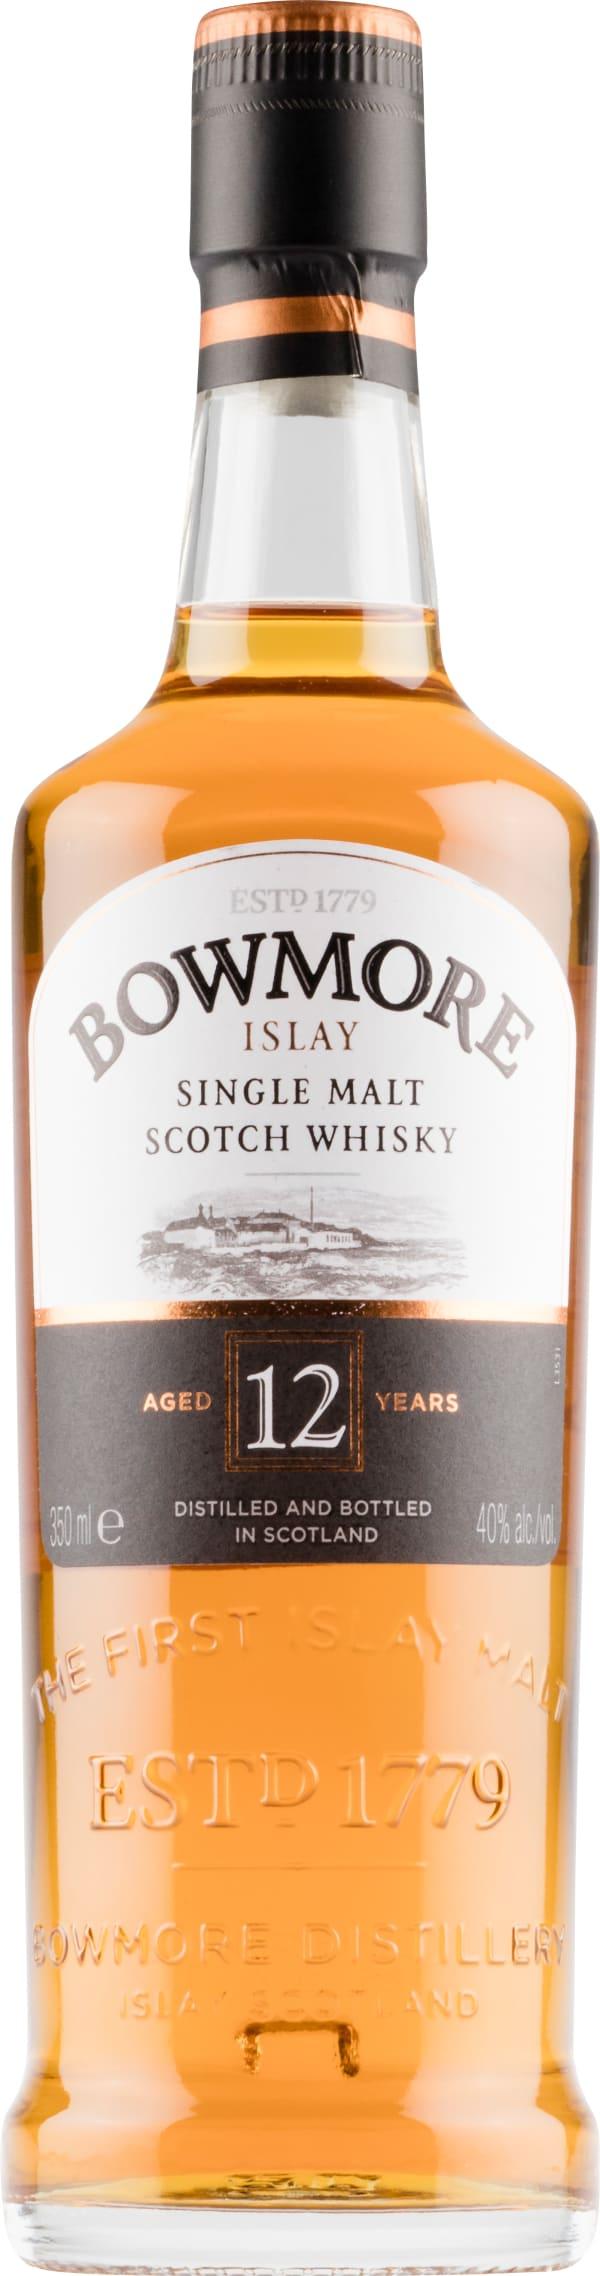 Bowmore 12 Year Old Single Malt